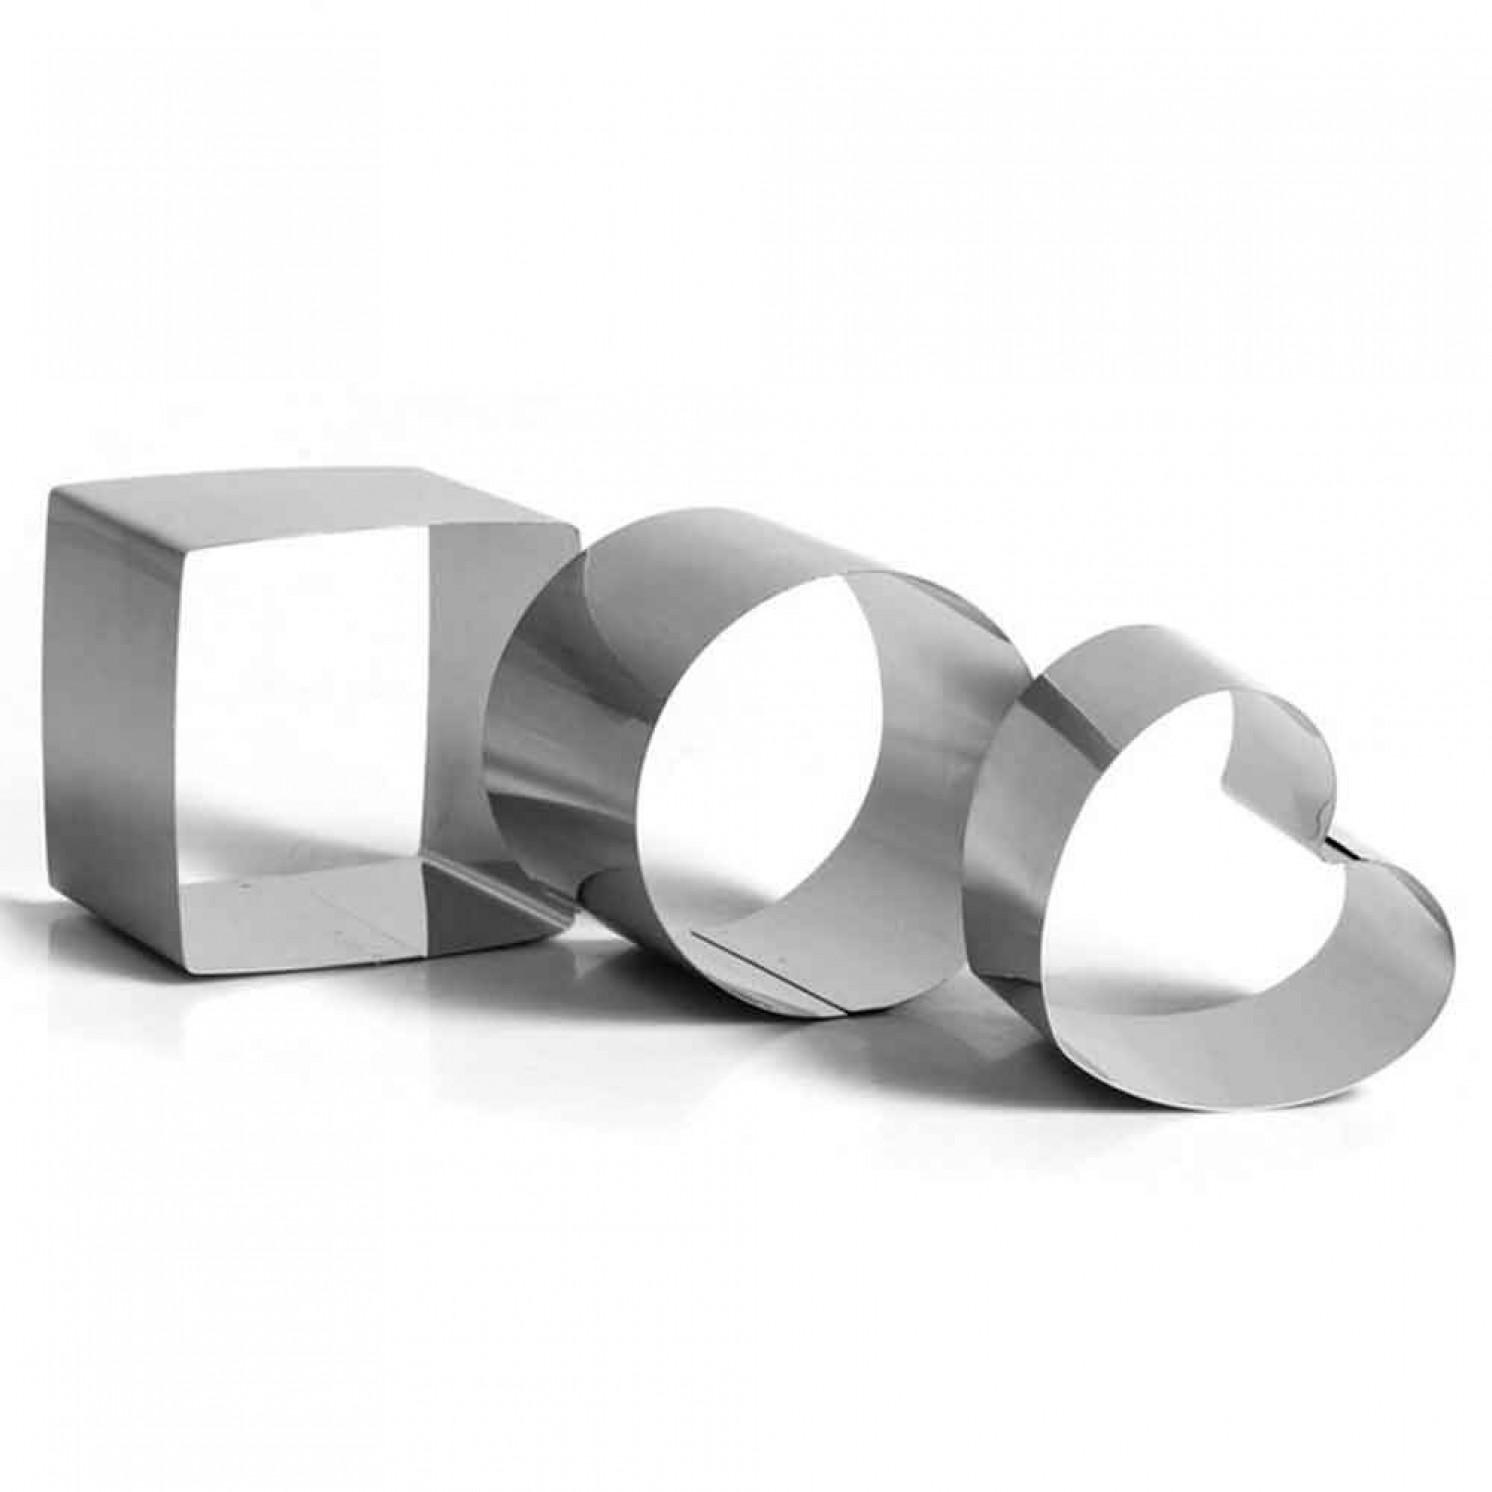 "Набор форм для выпечки и выкладки ""Круг, квадрат, сердце"", 10 х 10 х 8 см, 3 шт."